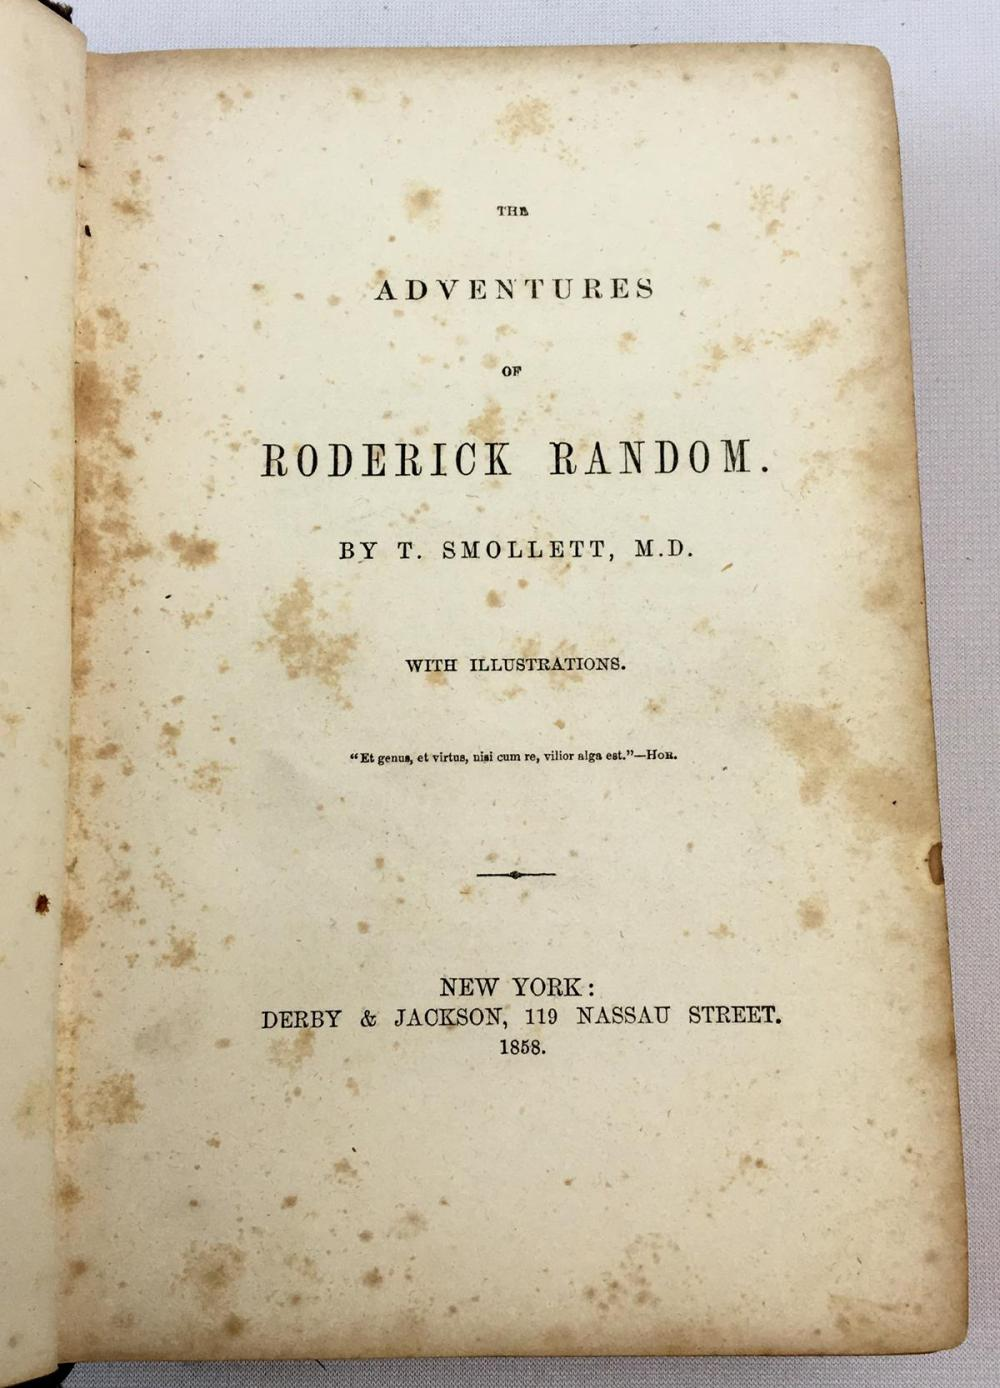 1858 The Adventures of Roderick Random by T. Smollett, M.D.